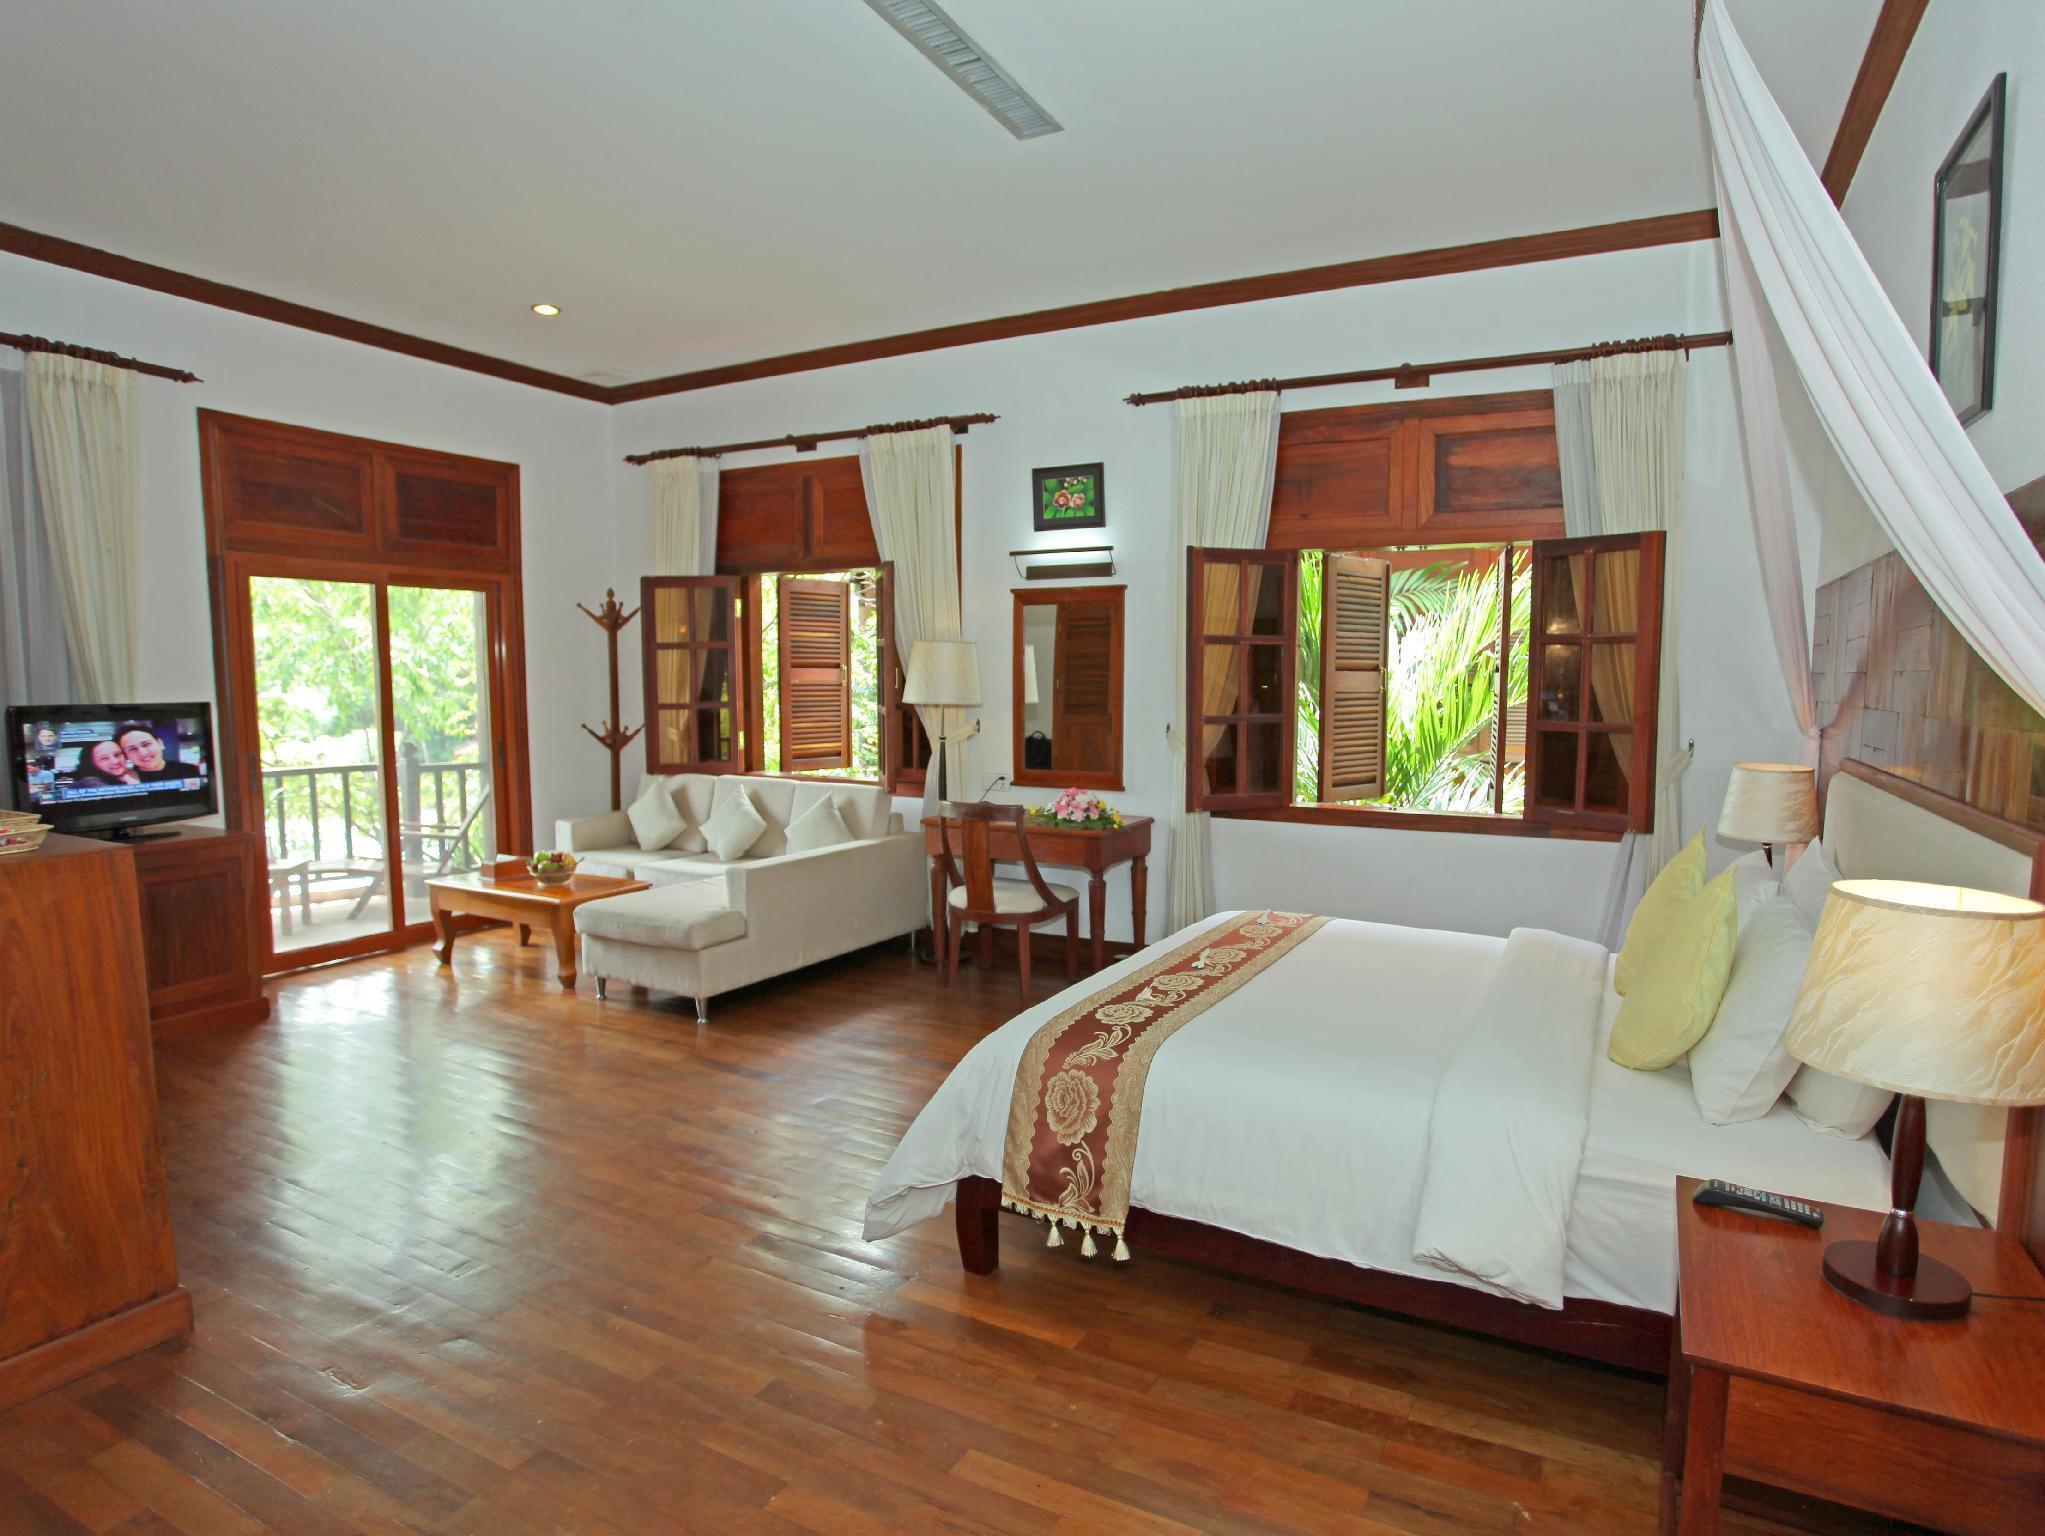 Sokhalay Angkor Villa Resort i Siem Reap til Bedste Pris-garanti ...